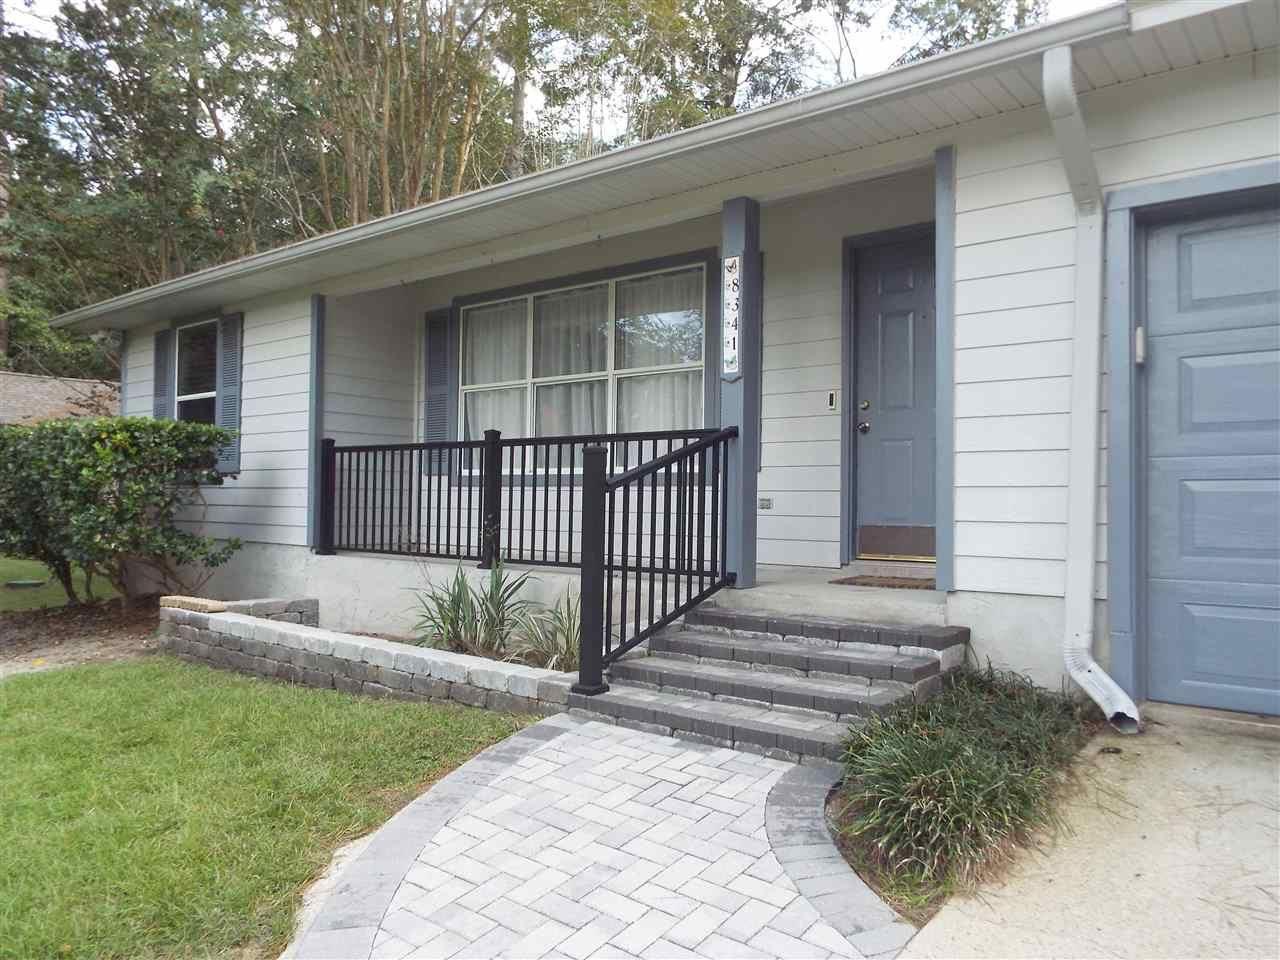 Photo of 8341 Chickasaw Trail, TALLAHASSEE, FL 32312 (MLS # 323370)